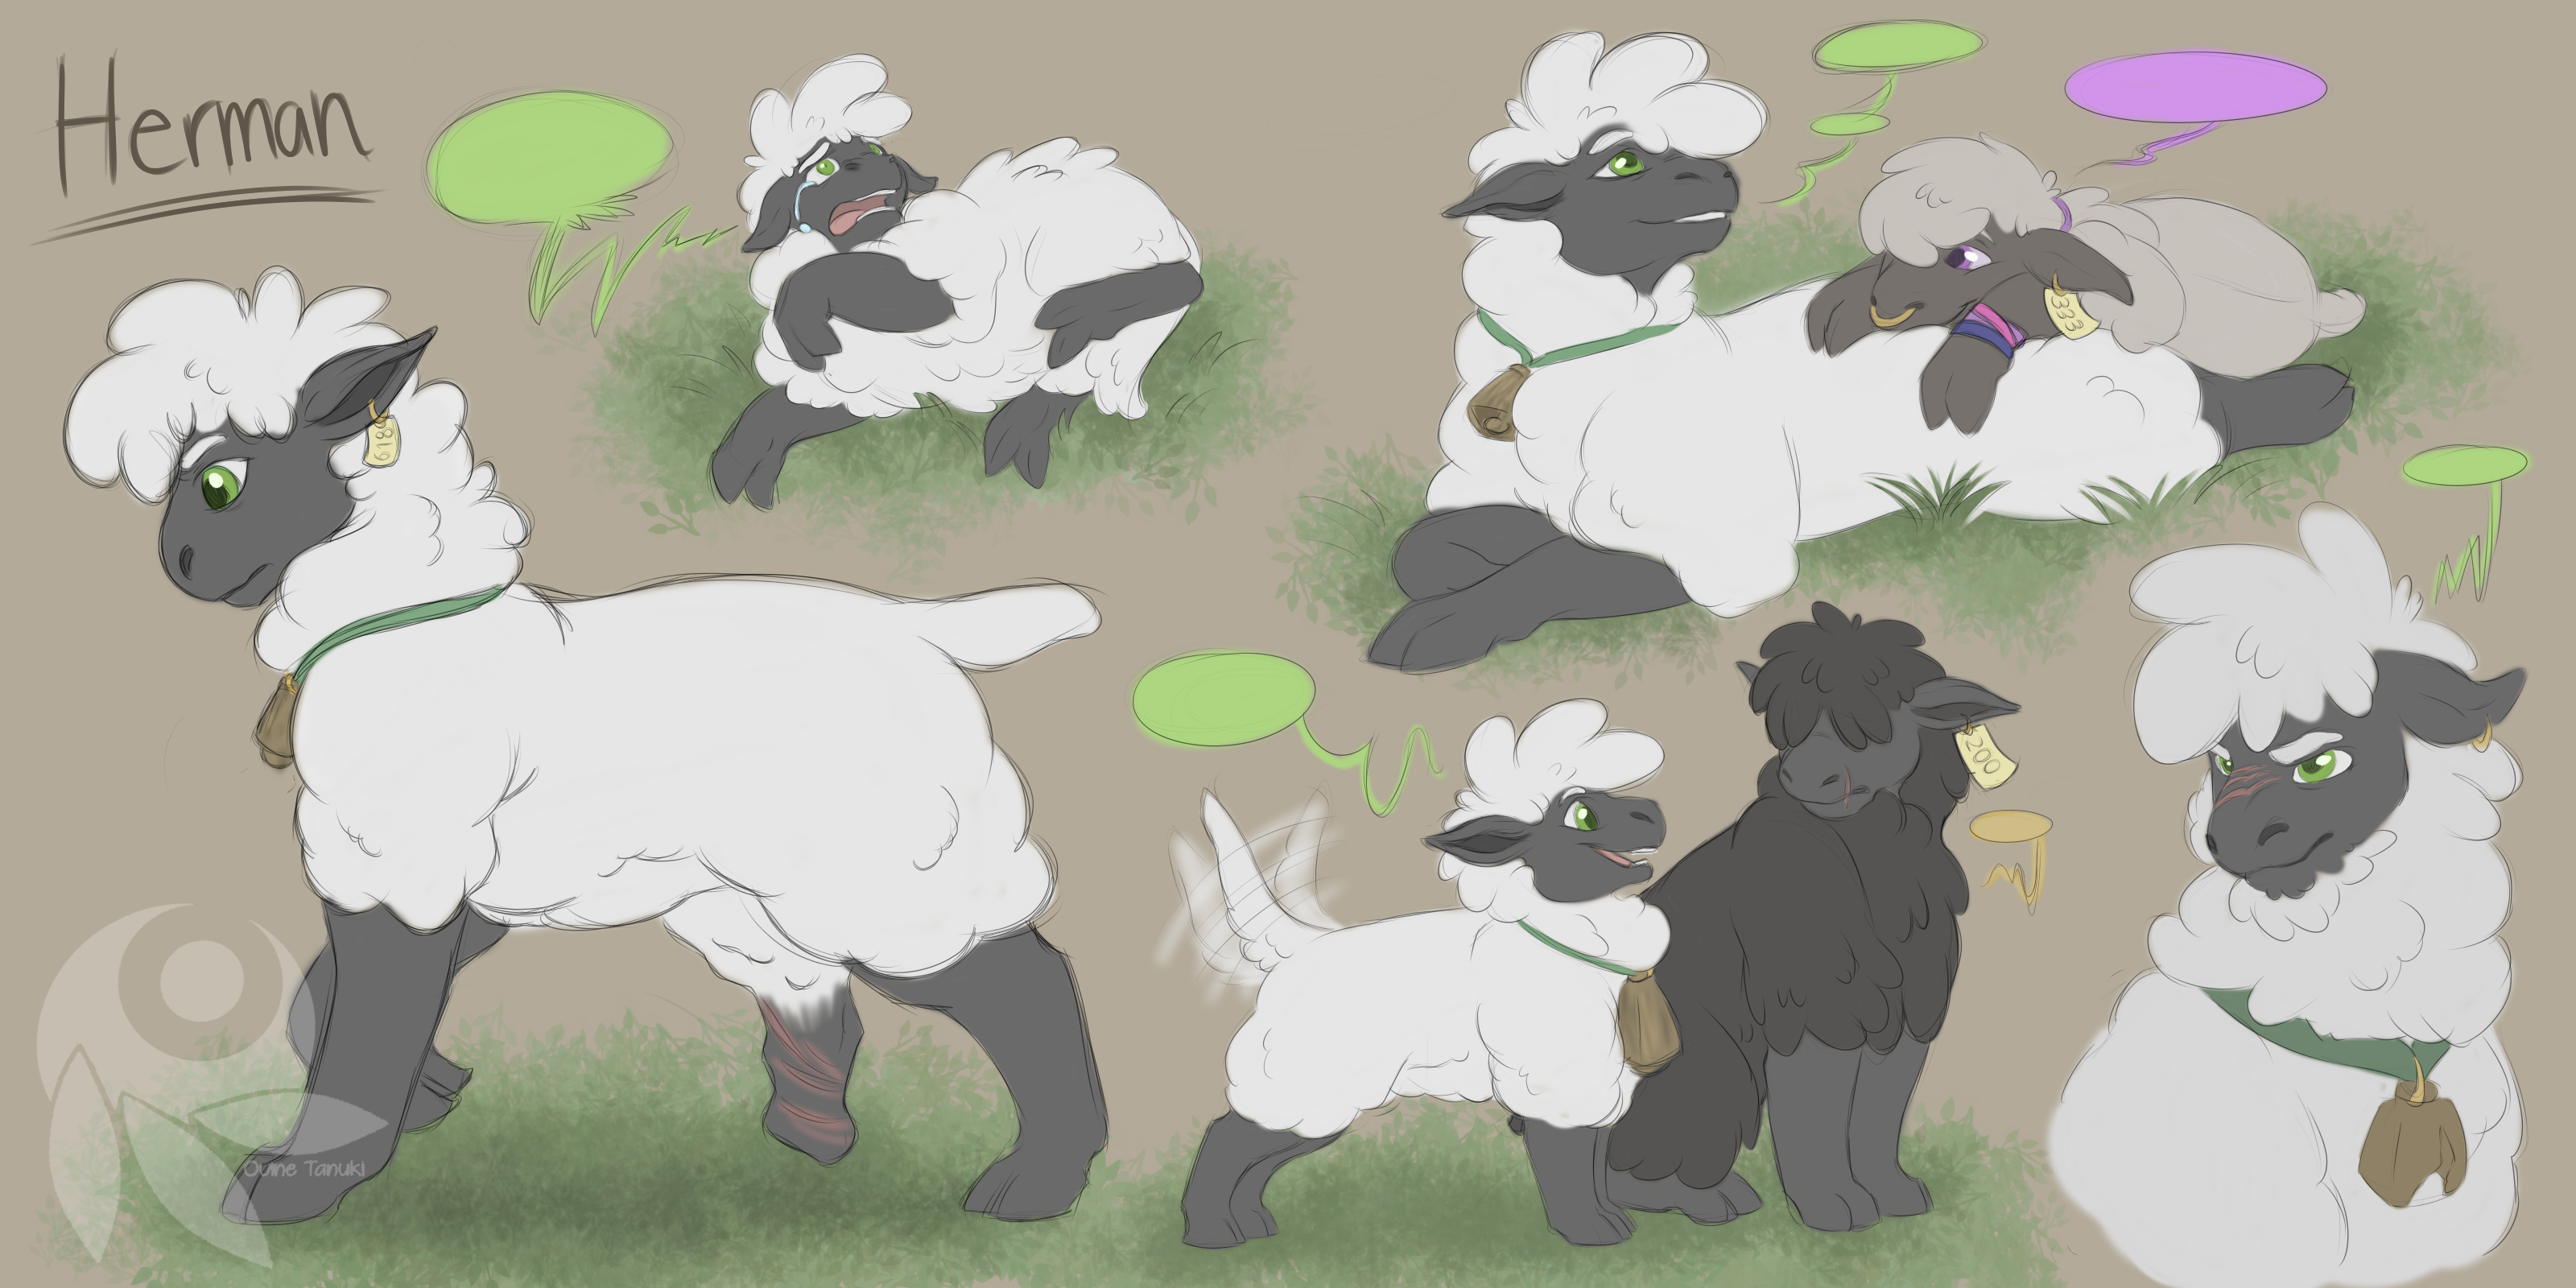 The most nugatory sheep